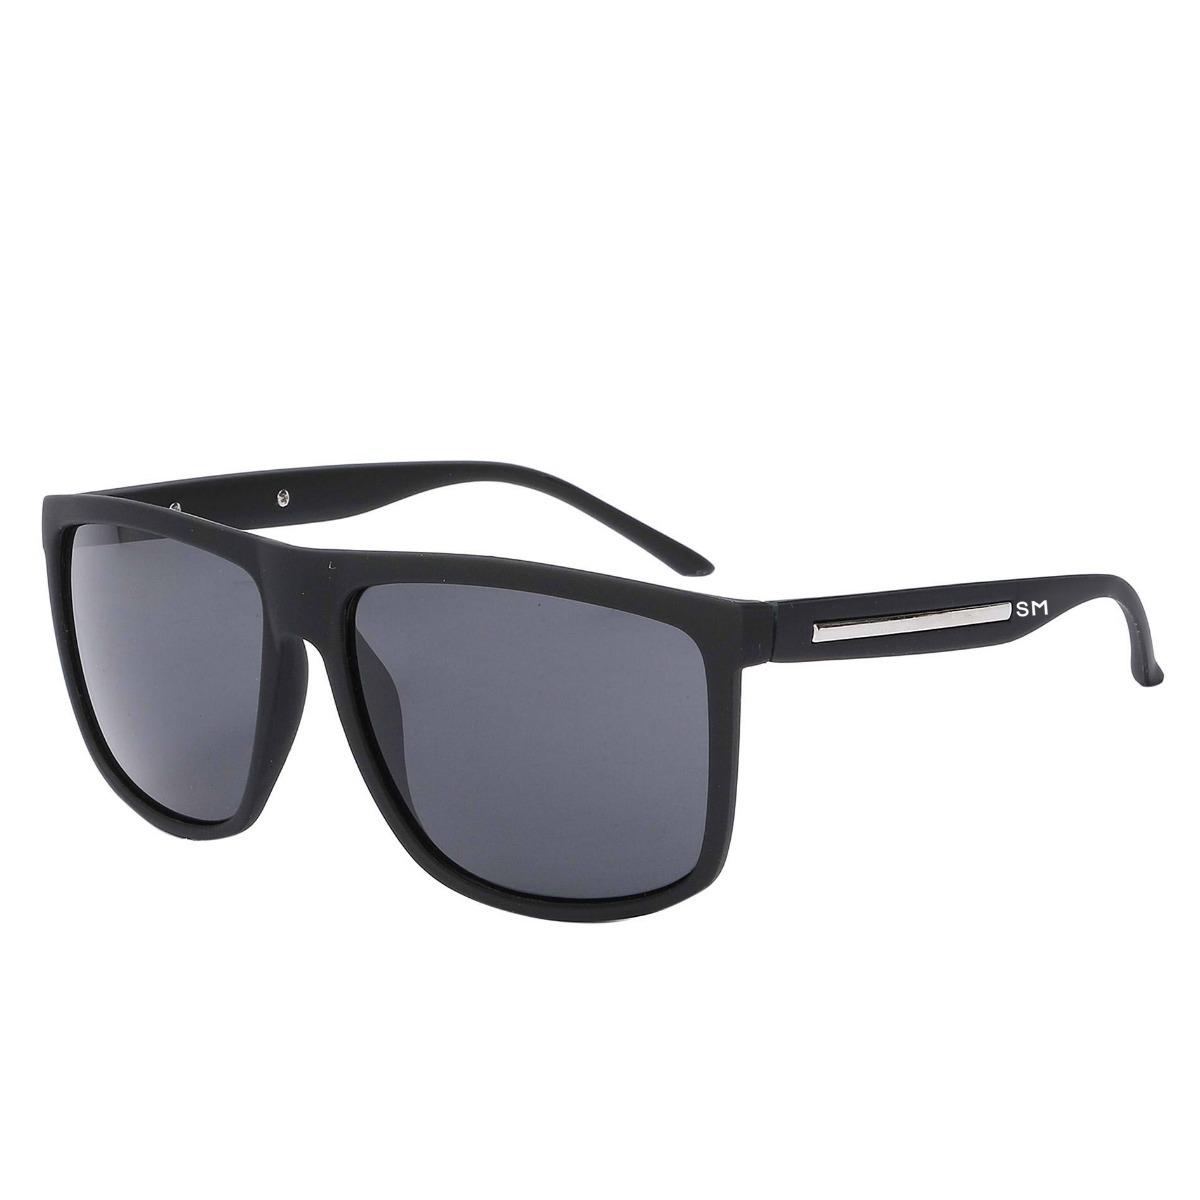 Óculos De Sol Masculino Sandro Moscoloni Adam Preto - R  99,90 em ... 4a7e5f57d3